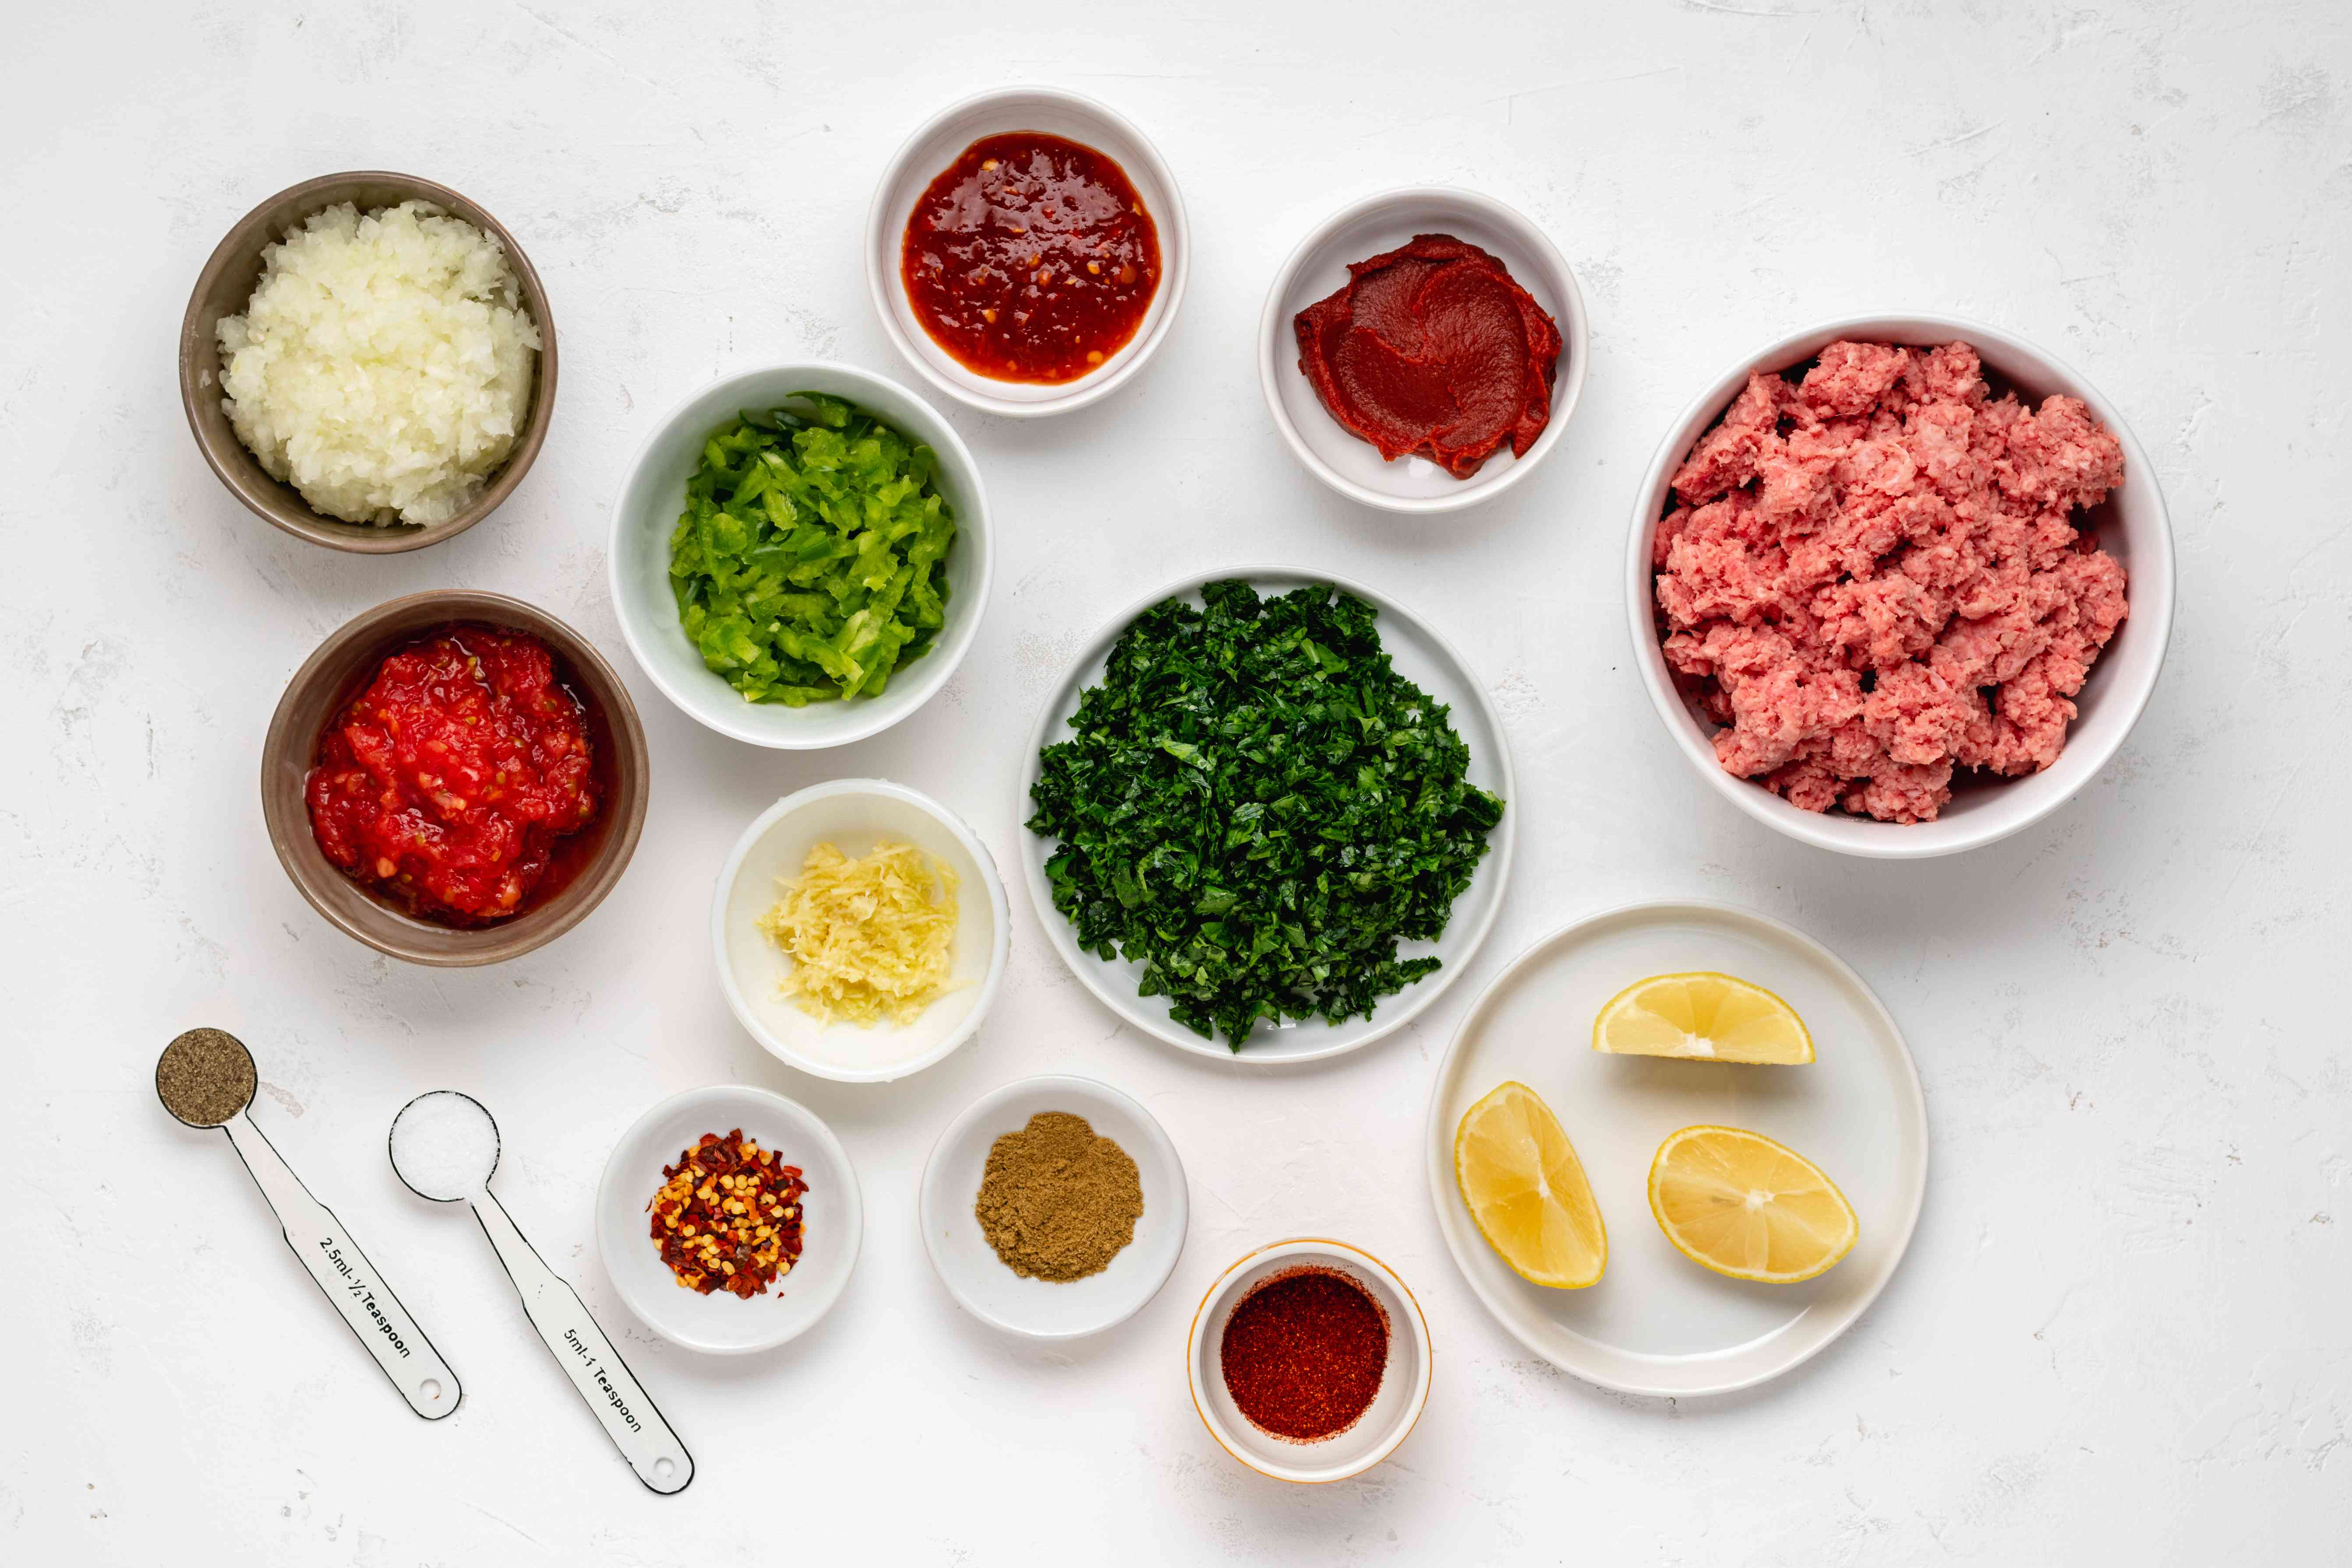 Homemade Turkish lahmacun filling ingredients